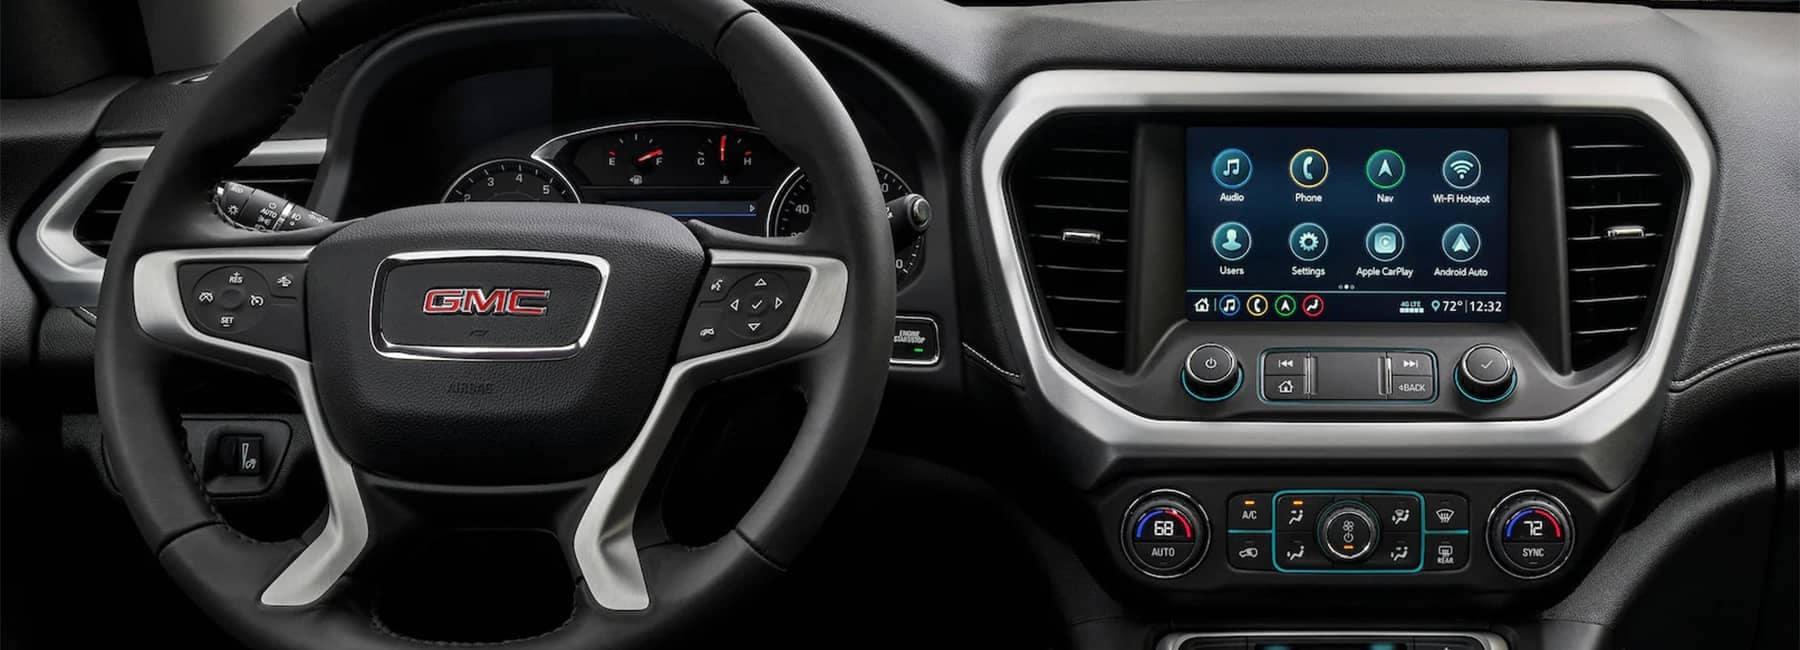 2020 GMC Acadia Mid-Size SUV- interior dash panel